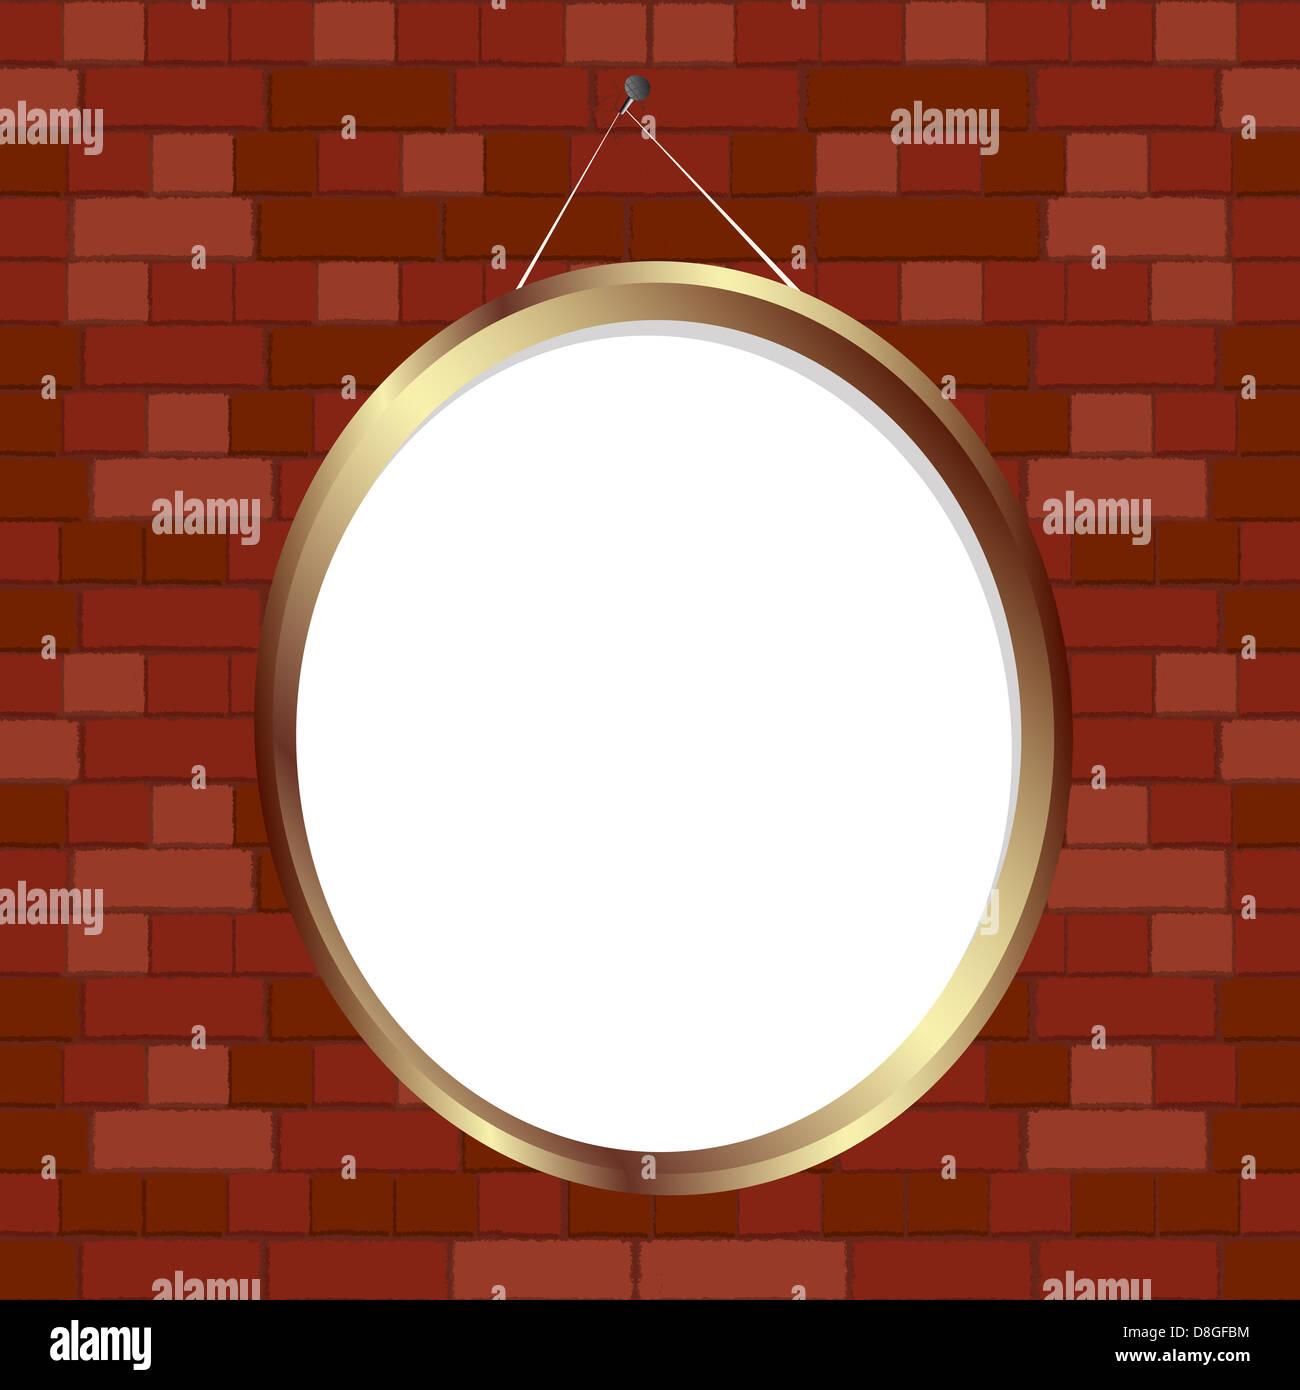 Oval frame - Stock Image